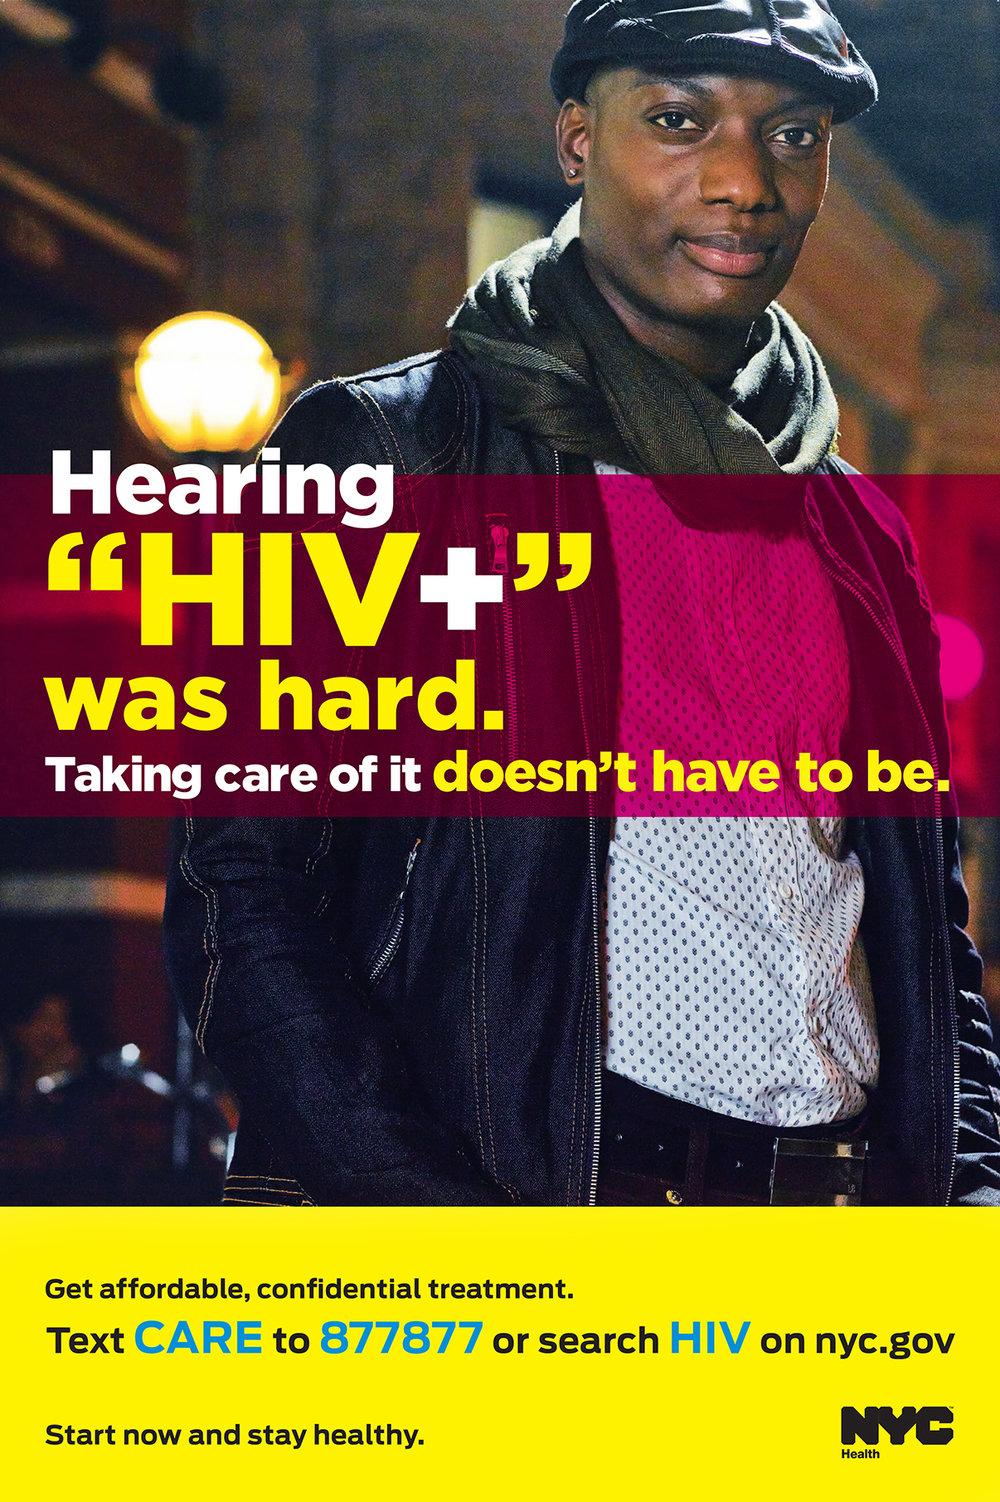 NYCDOH_HIV-2.jpg